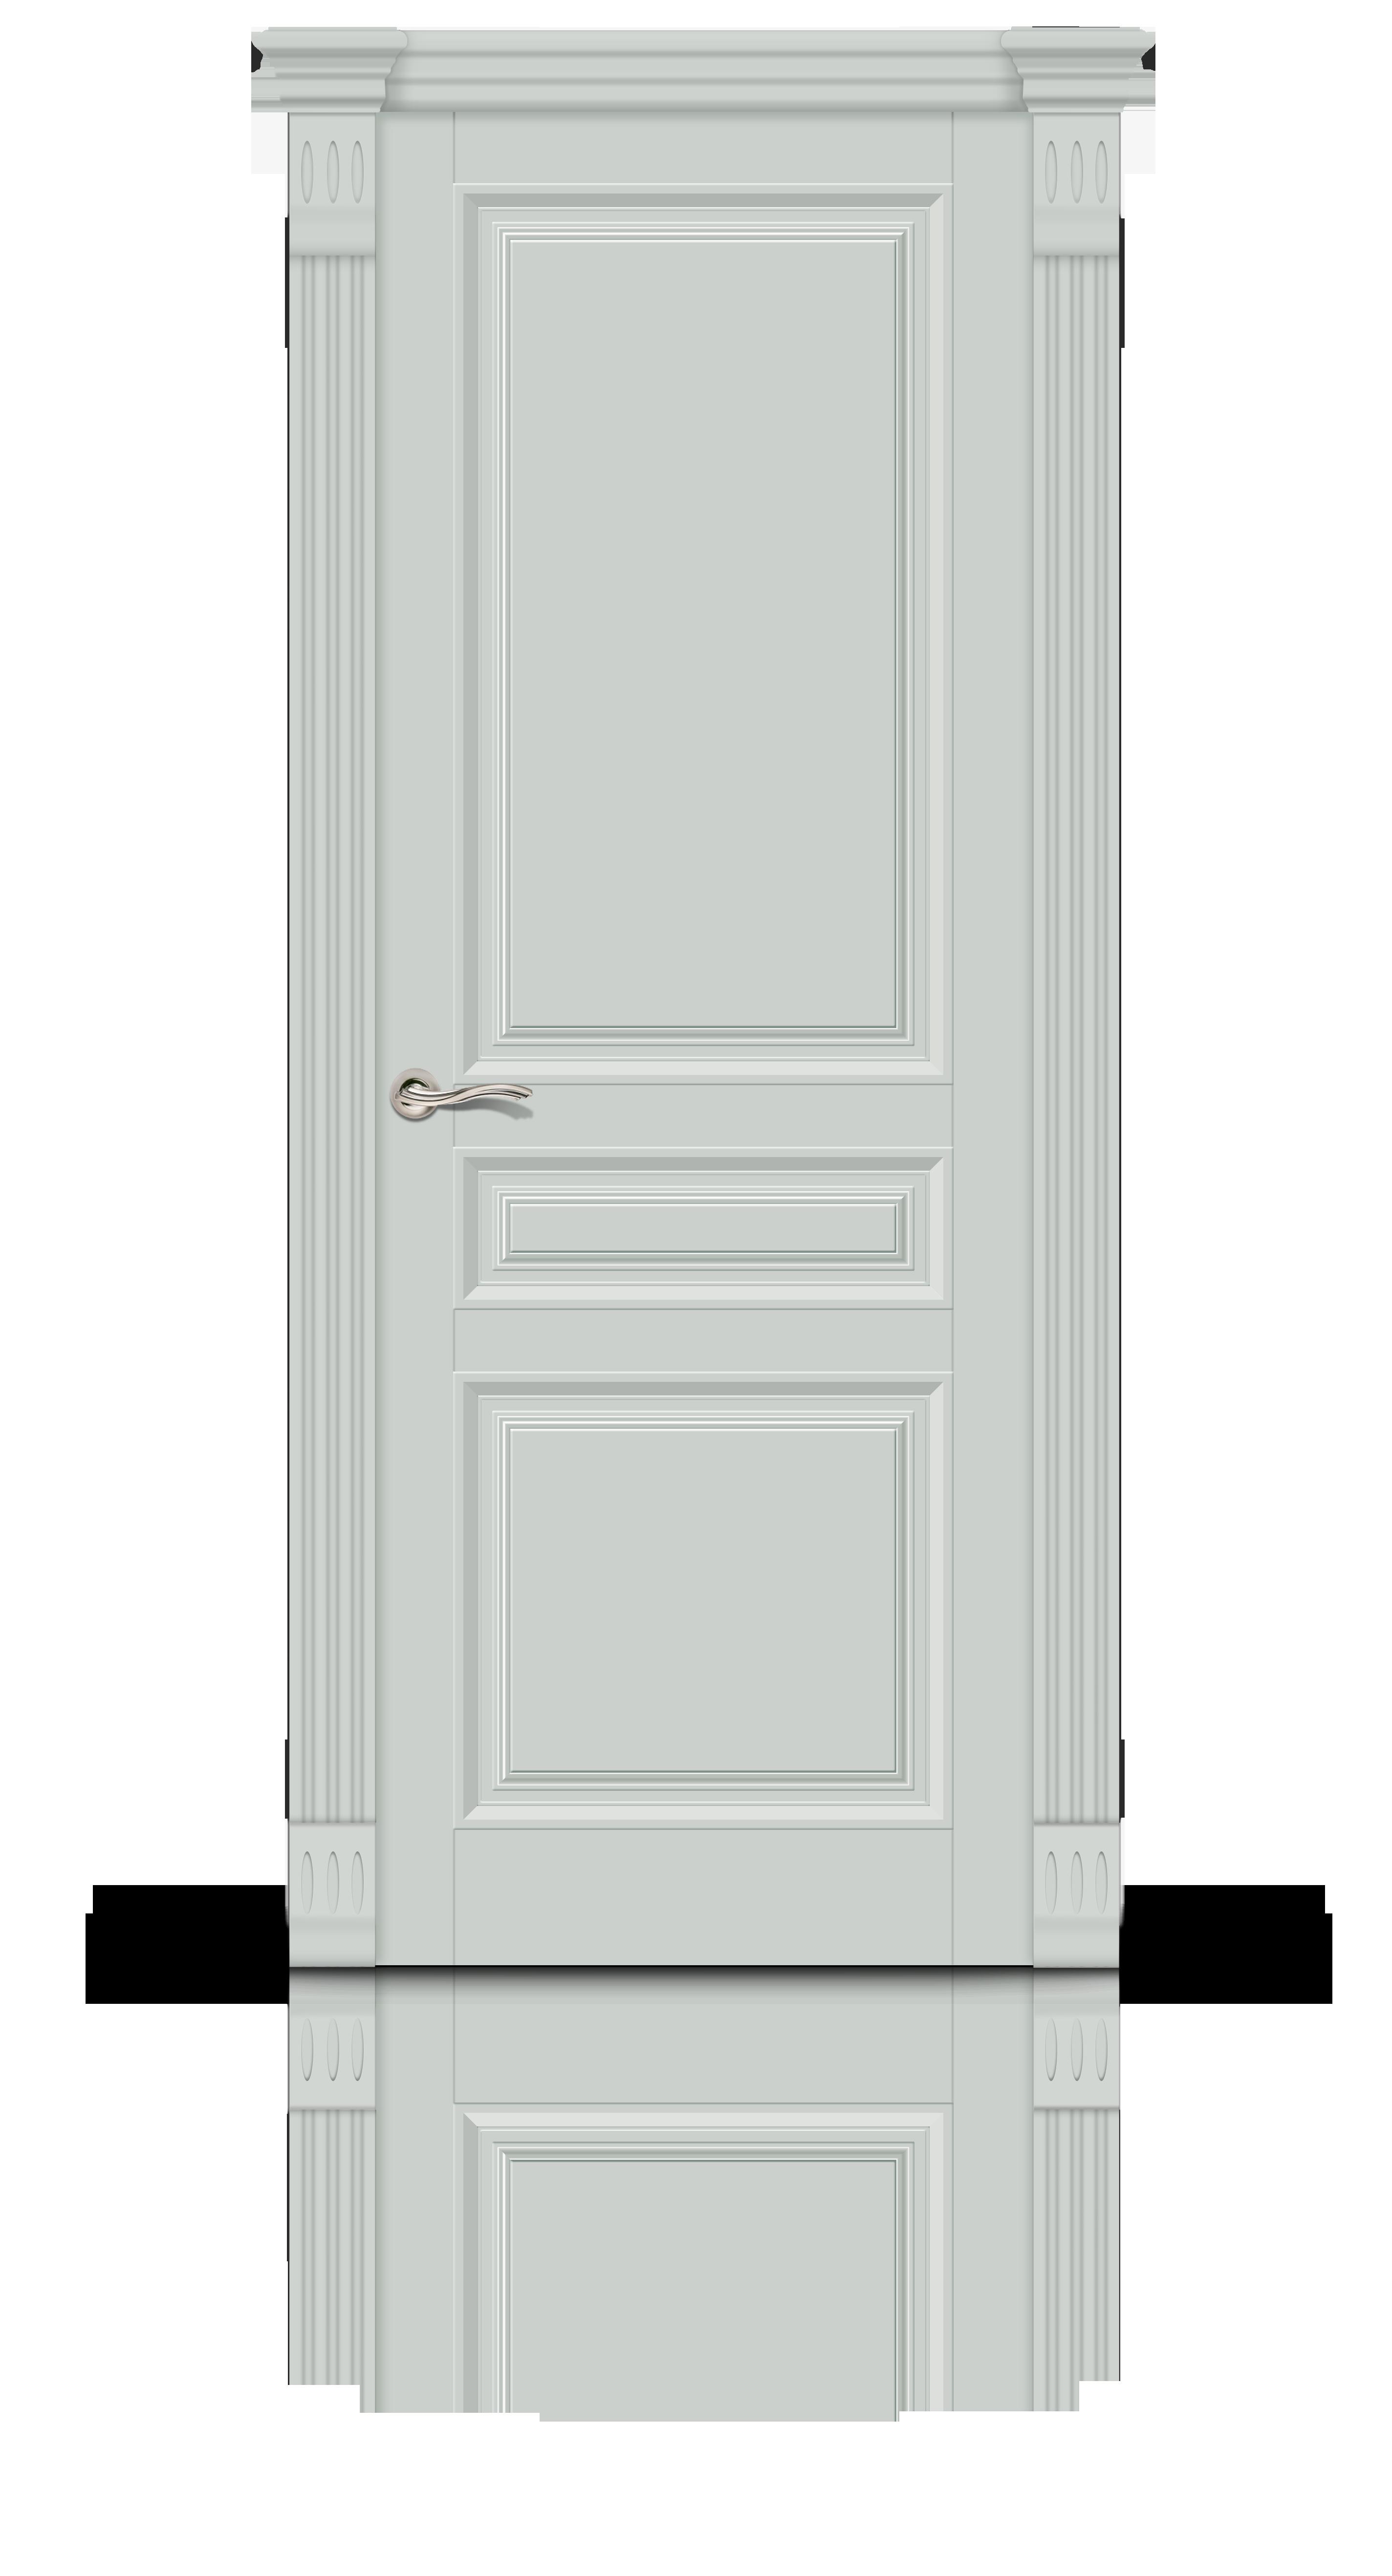 Венеция эмаль RAL 7035 серый